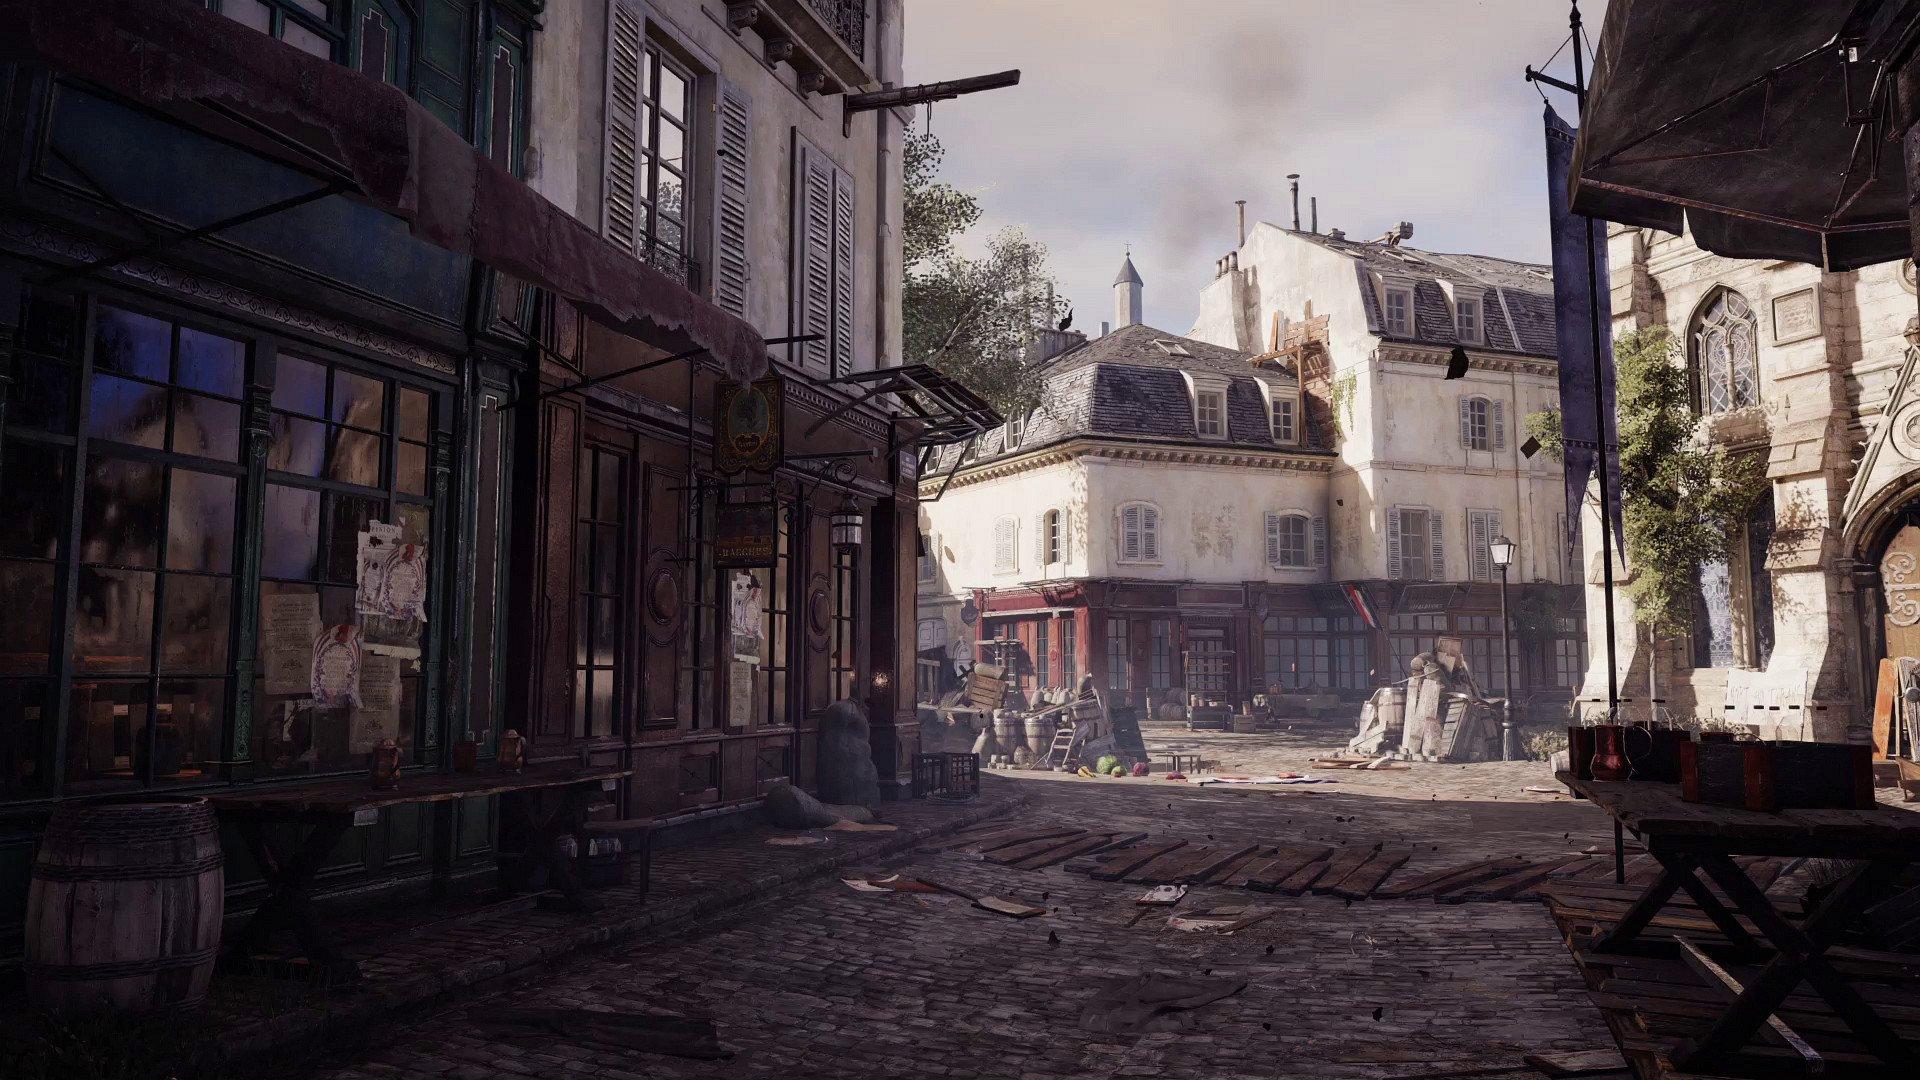 assassin  039 s creed unity 2492275 با اولین تصاویر از Assassin's Creed : Unity همراه شوید : بازی تنها بر روی نسل هشتم منتشر خواهد شد